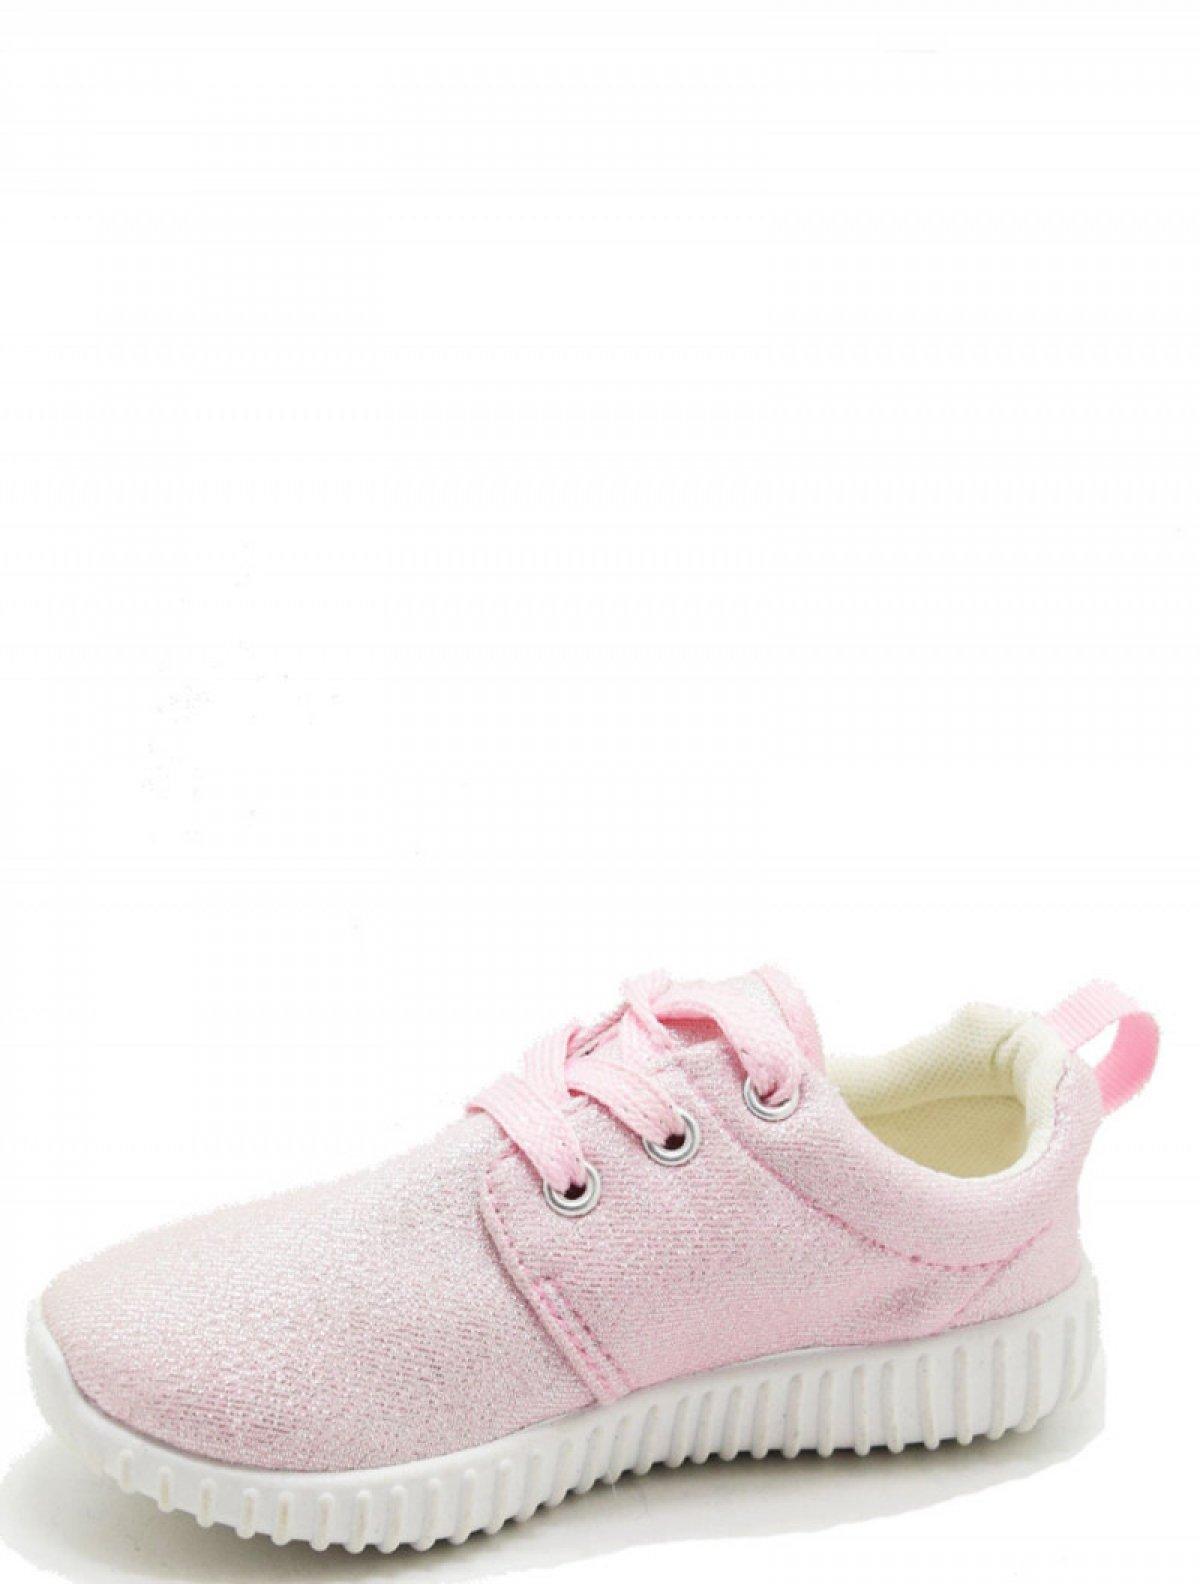 PATROL 980-128CS-17S-8-17 кроссовки для девочки